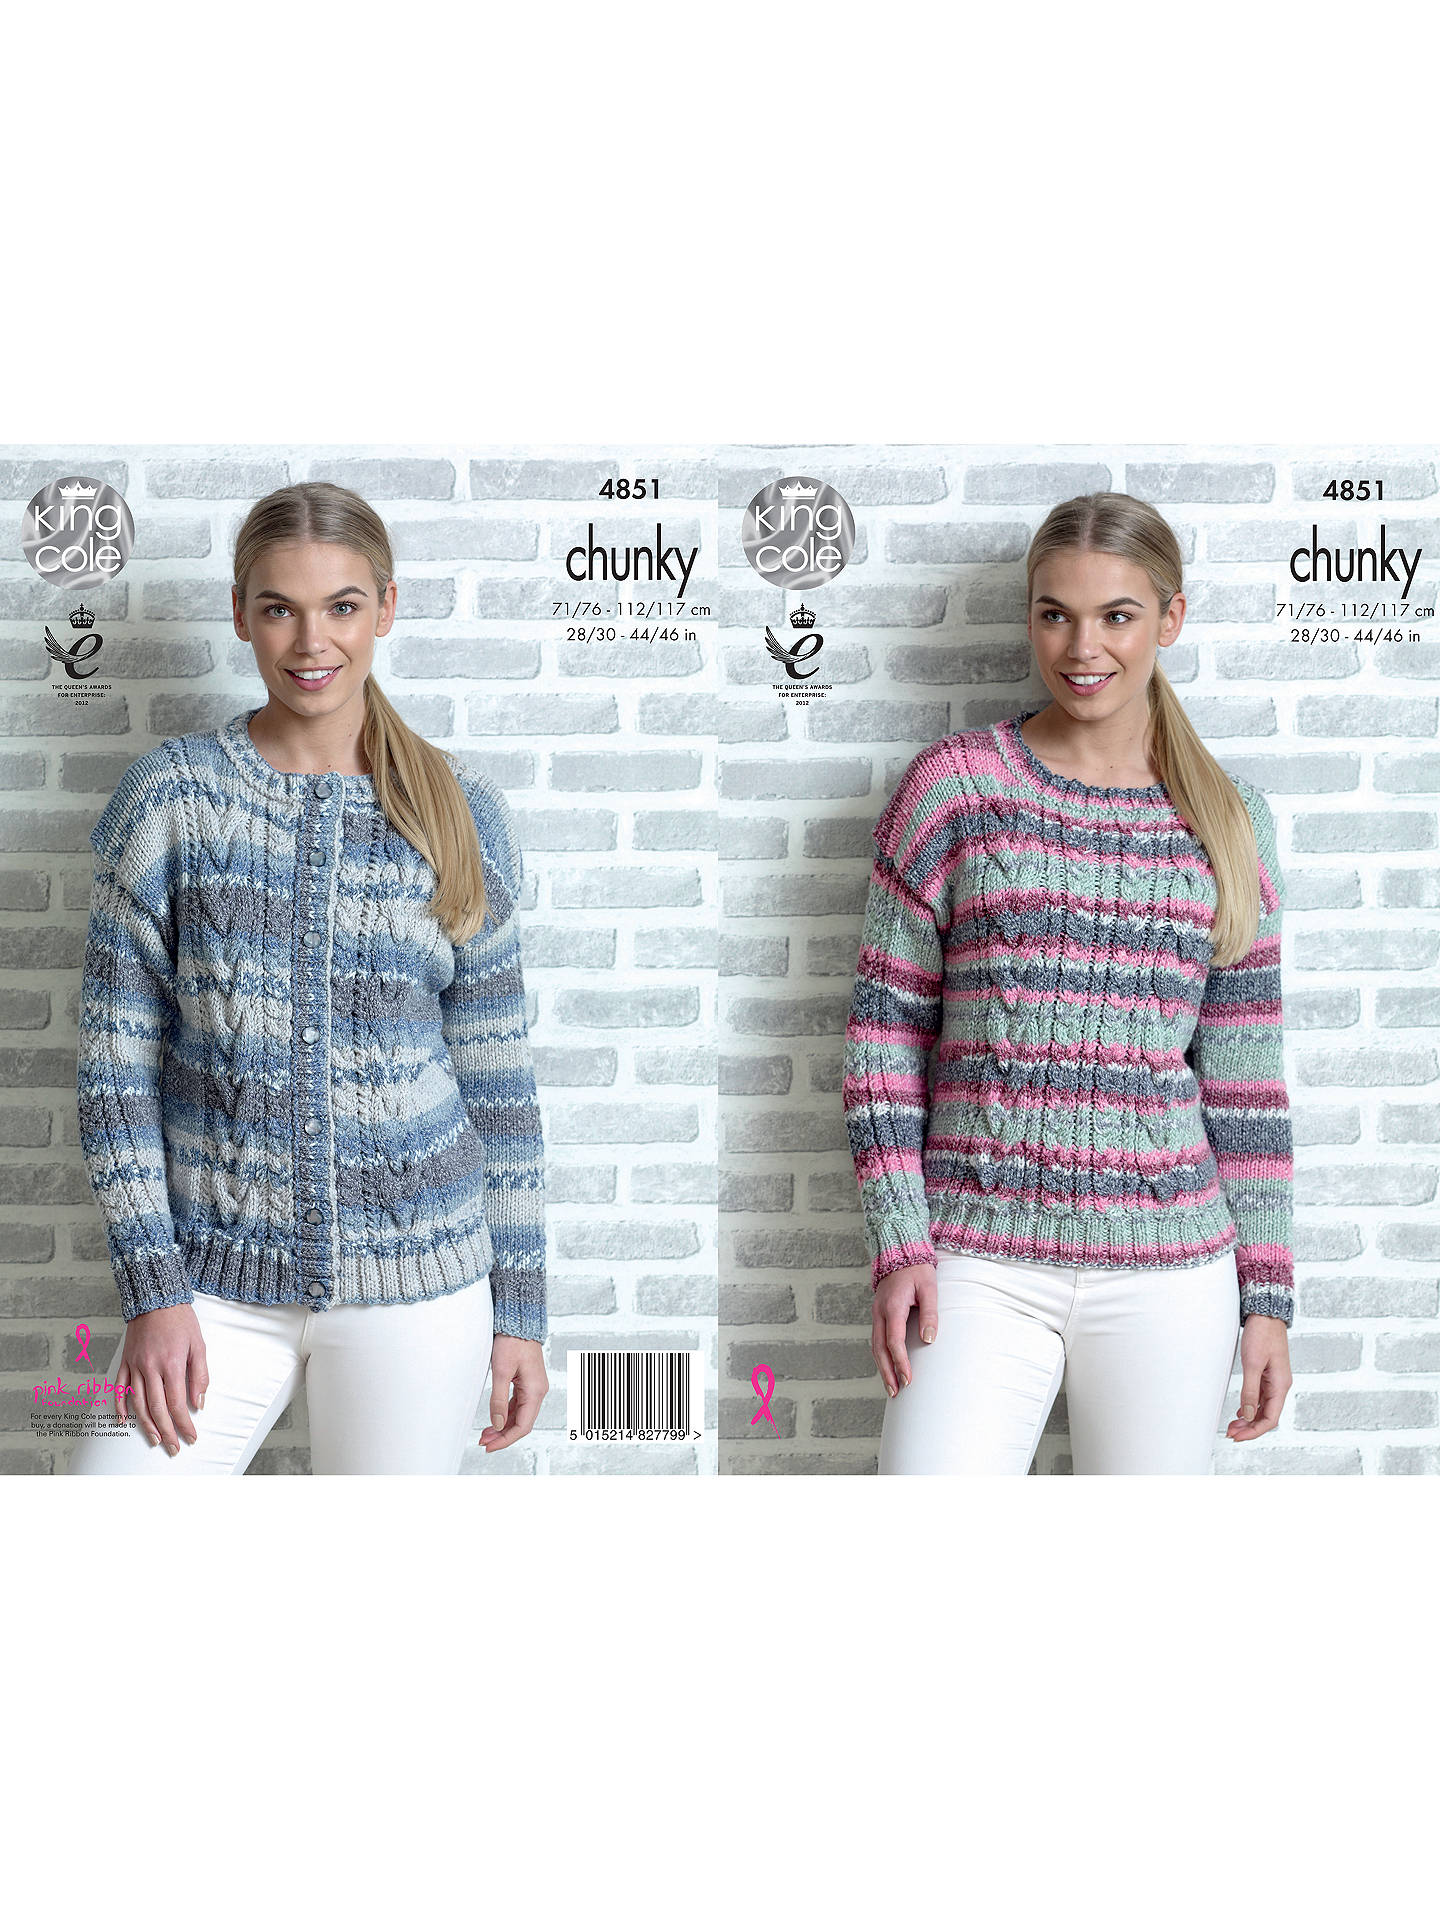 21ab5ac2279a9 Buy King Cole Drifter Chunky Women s Jumper Knitting Pattern